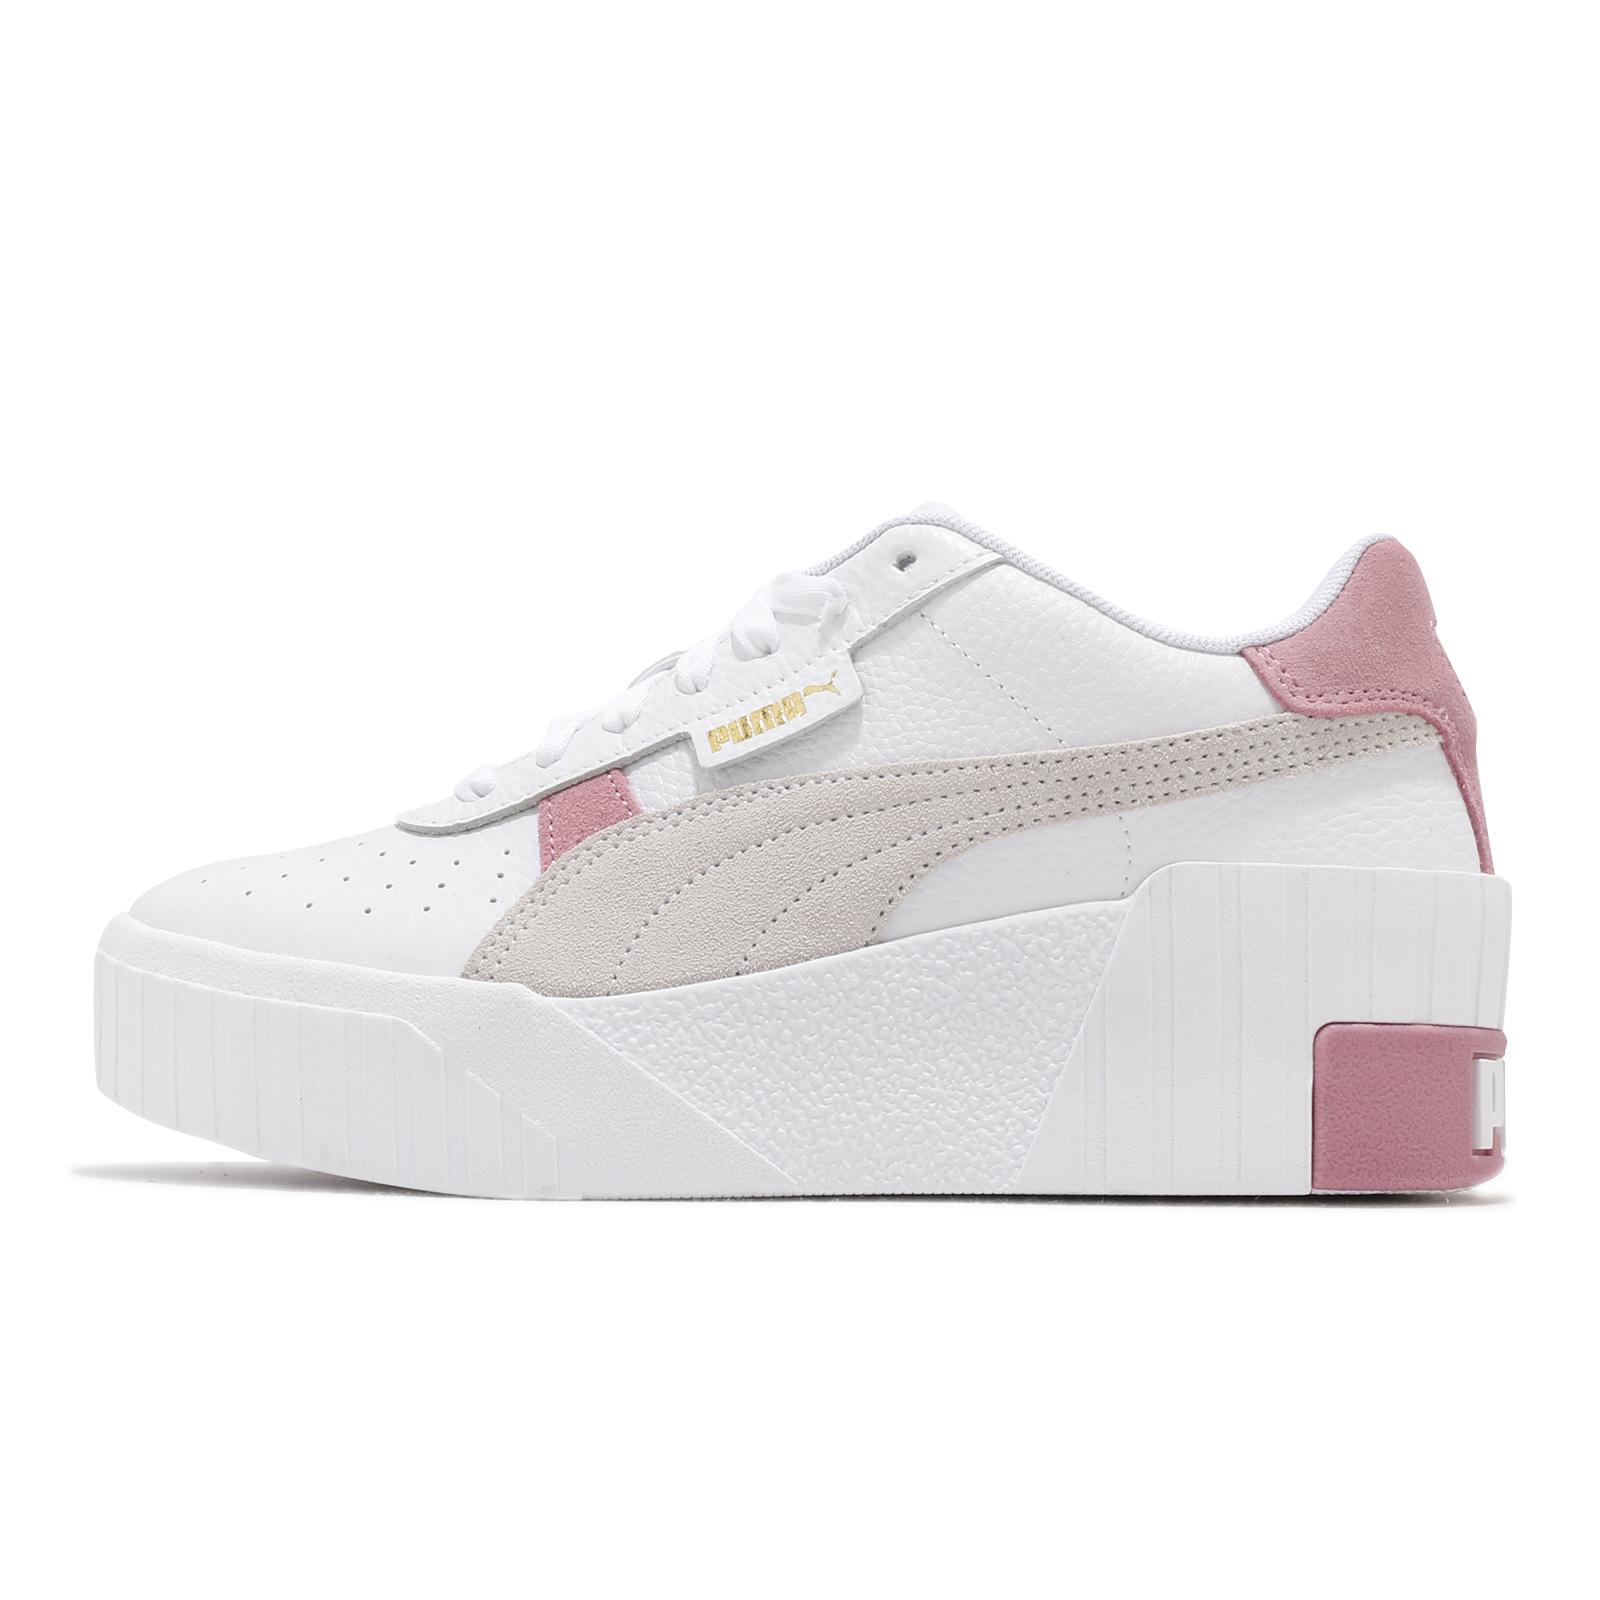 Puma 休閒鞋 Cali Wedge Mix 白 粉紅 女鞋 增高 厚底 皮革 運動鞋 【ACS】 37390602